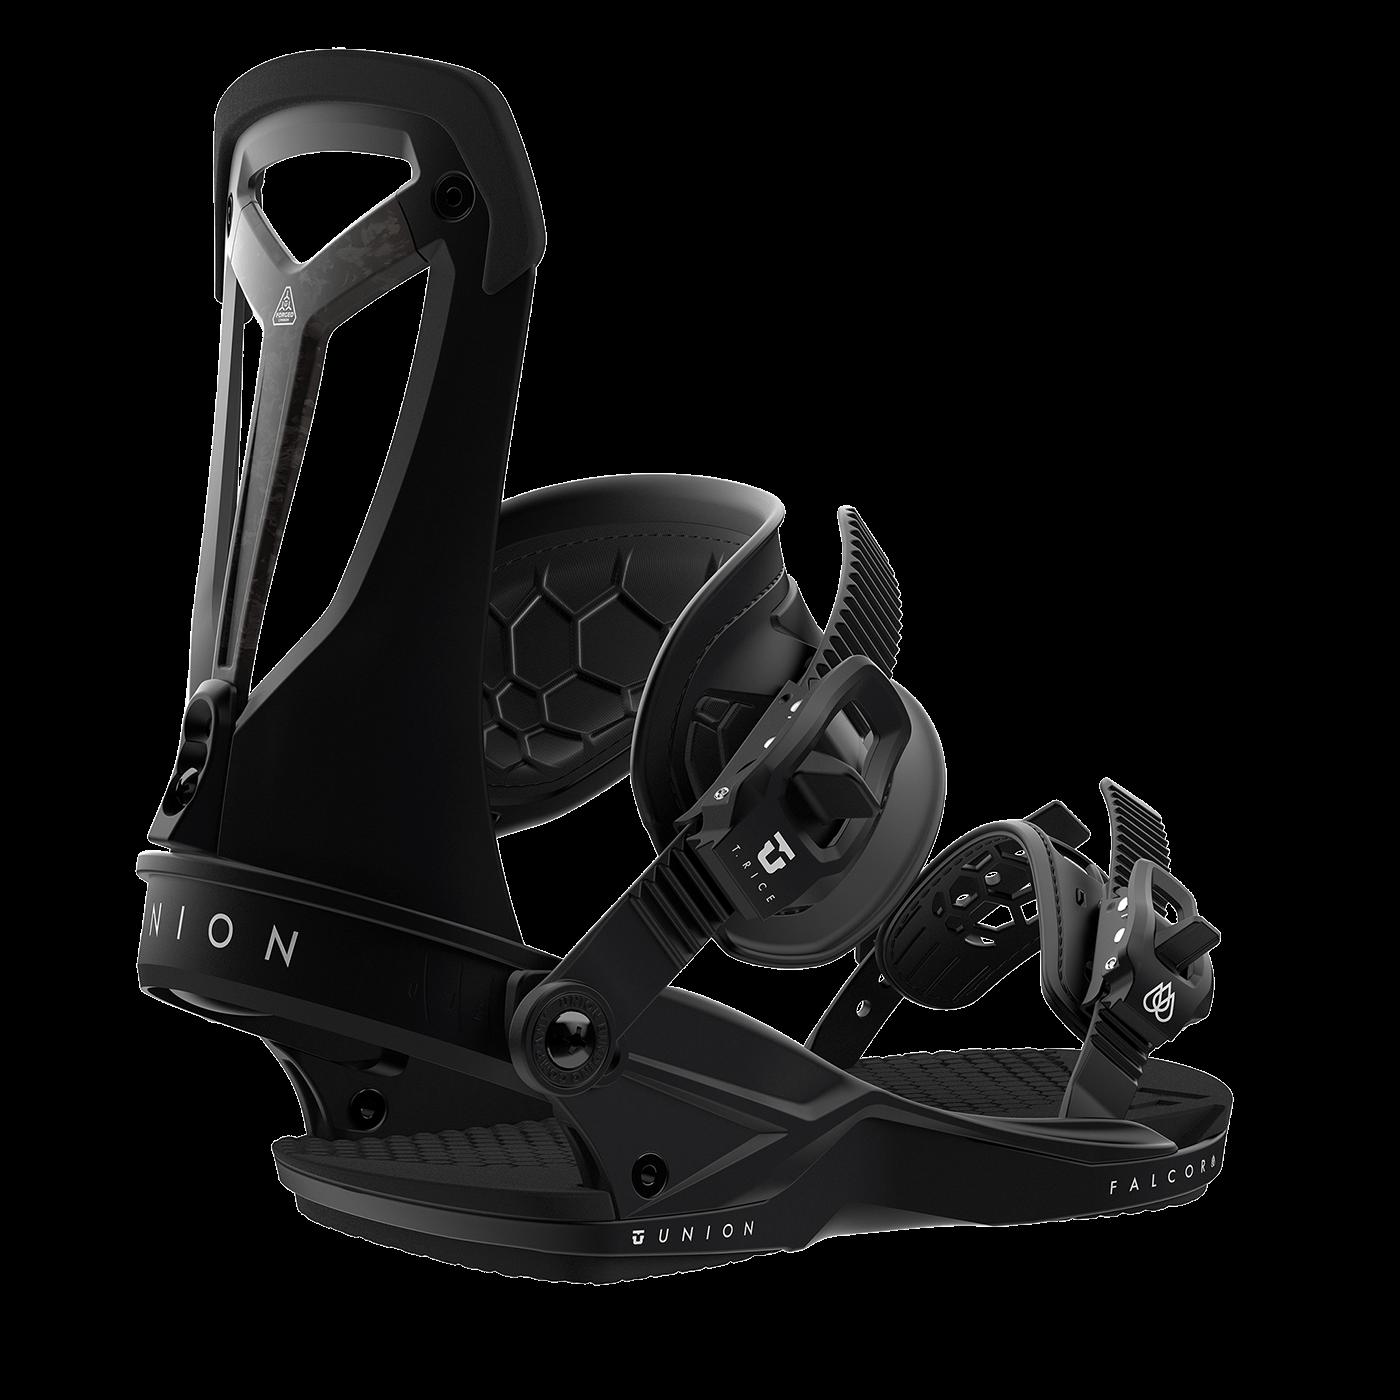 Union Falcor Snowboard Bindings